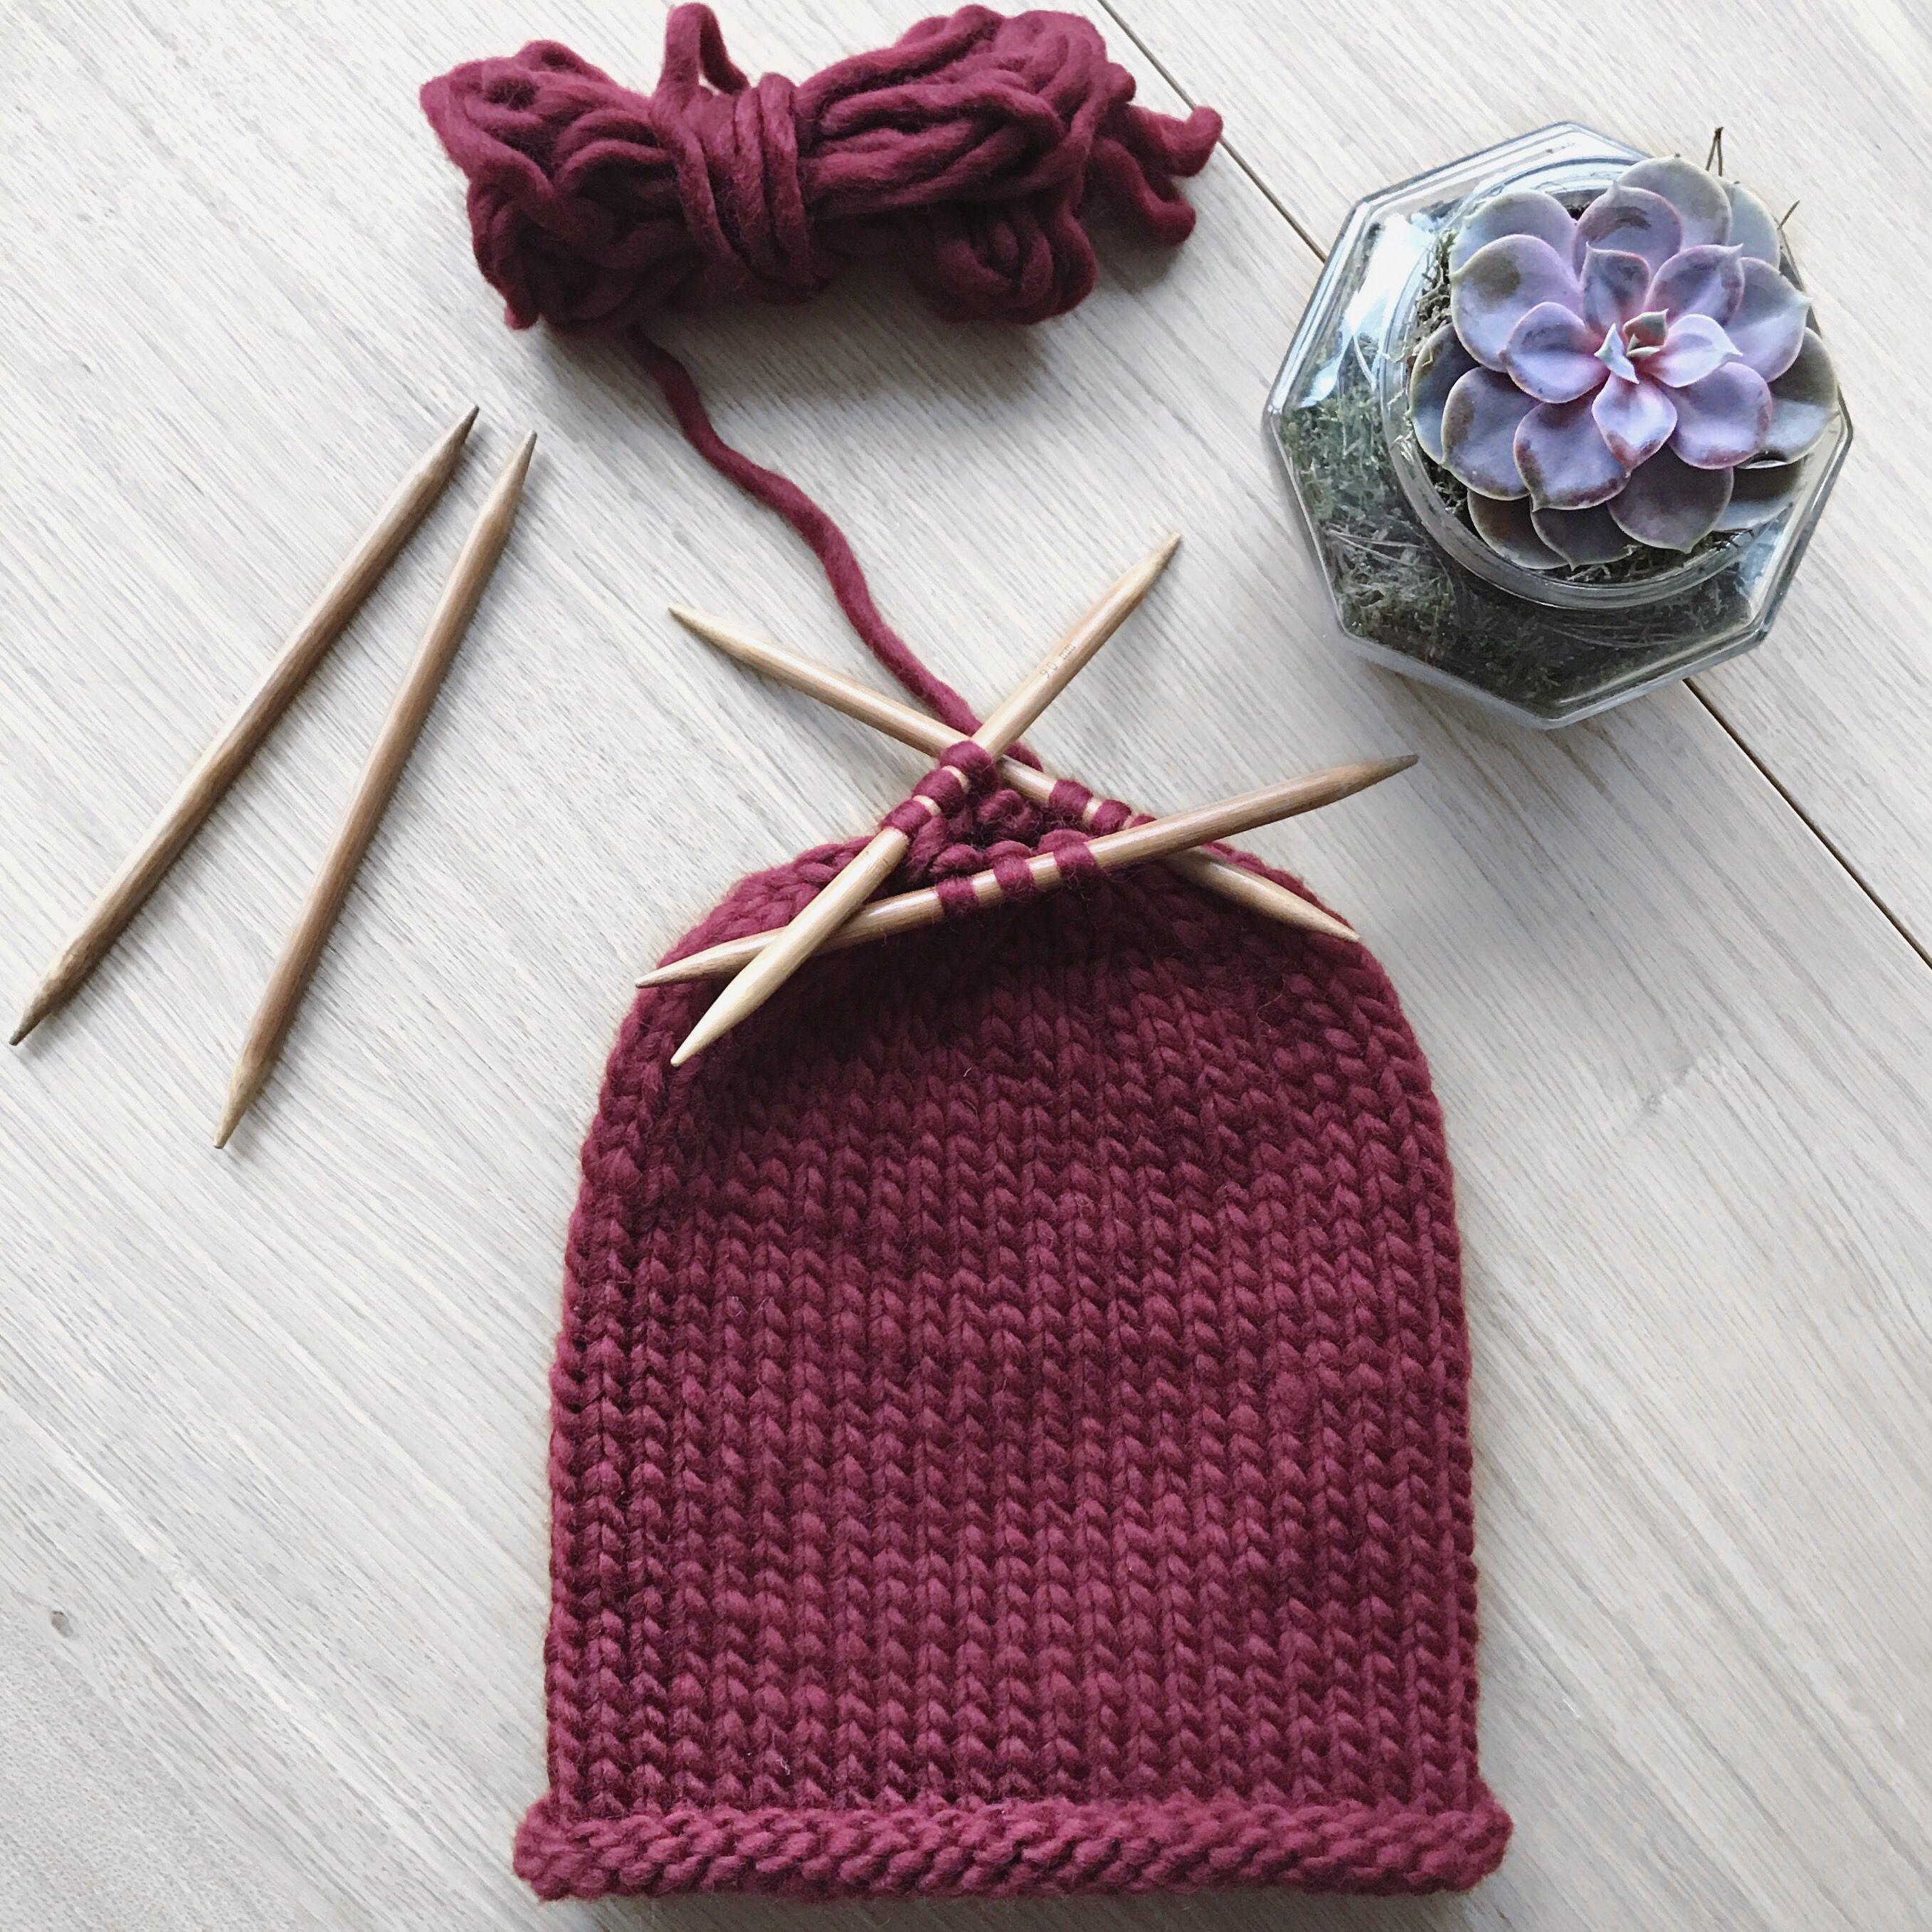 Knitted slouch beanie pattern | Yarn + | Pinterest